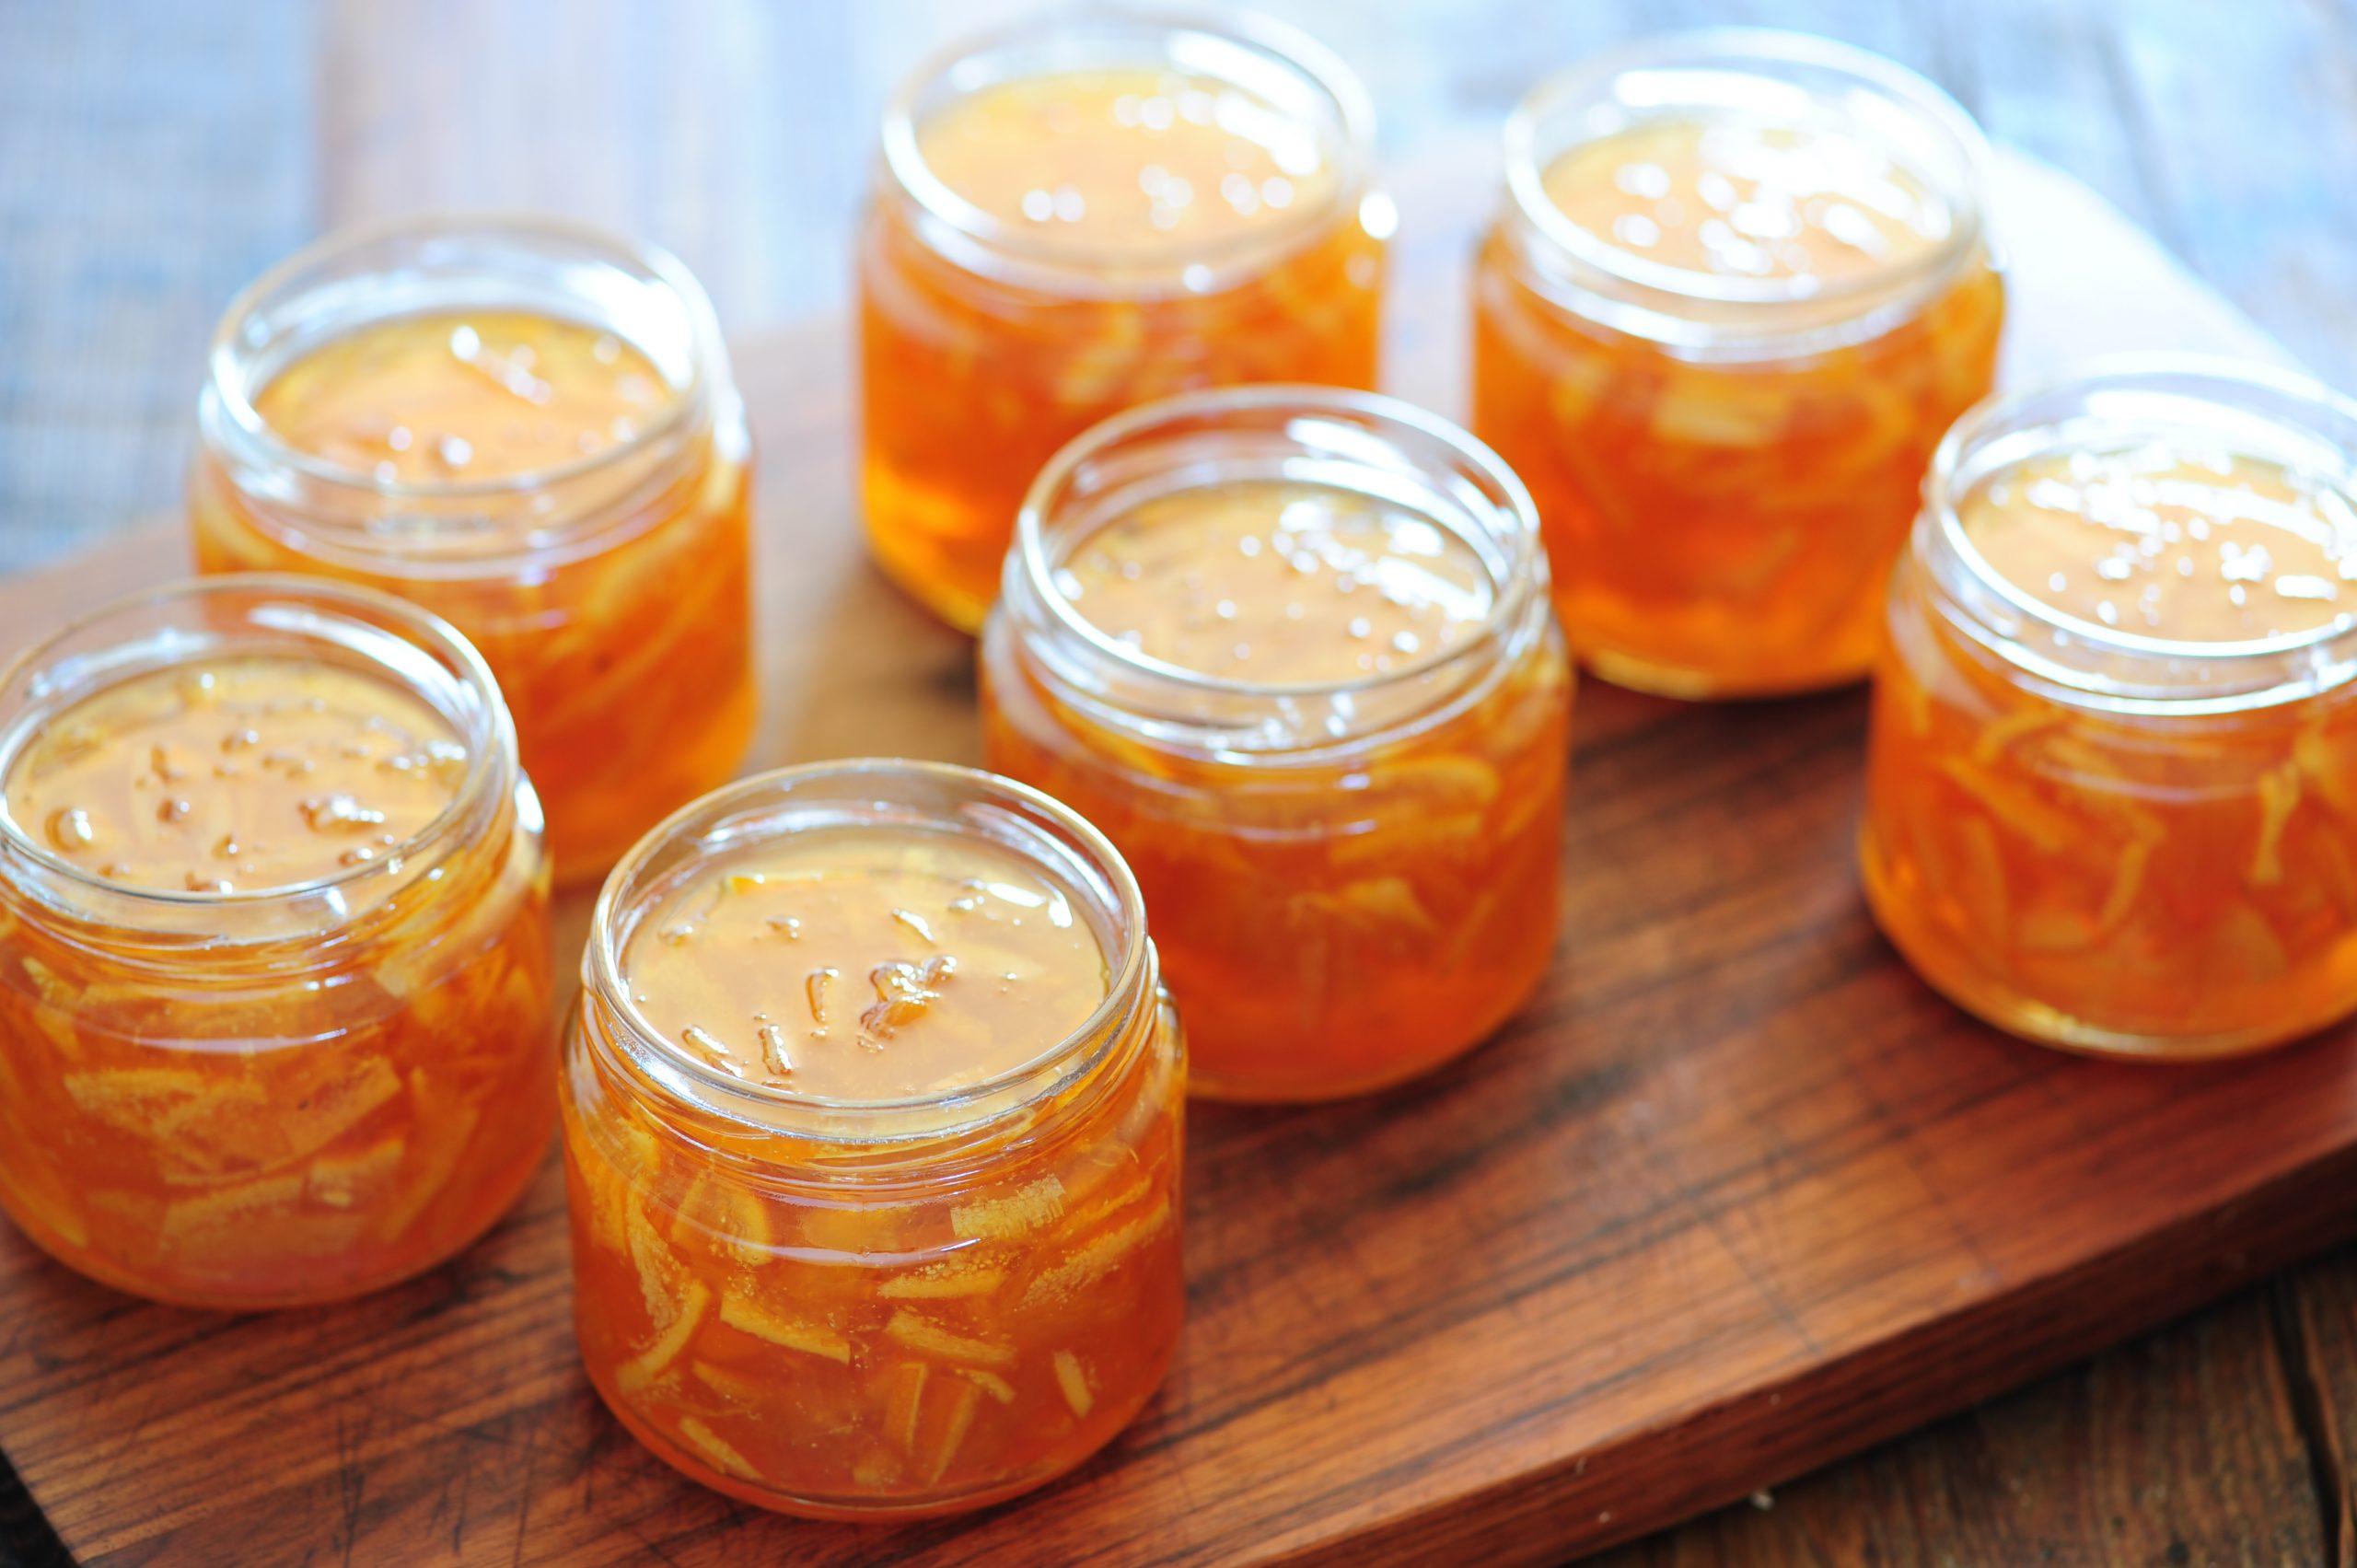 How to Make Orange Marmalade and Preserve It